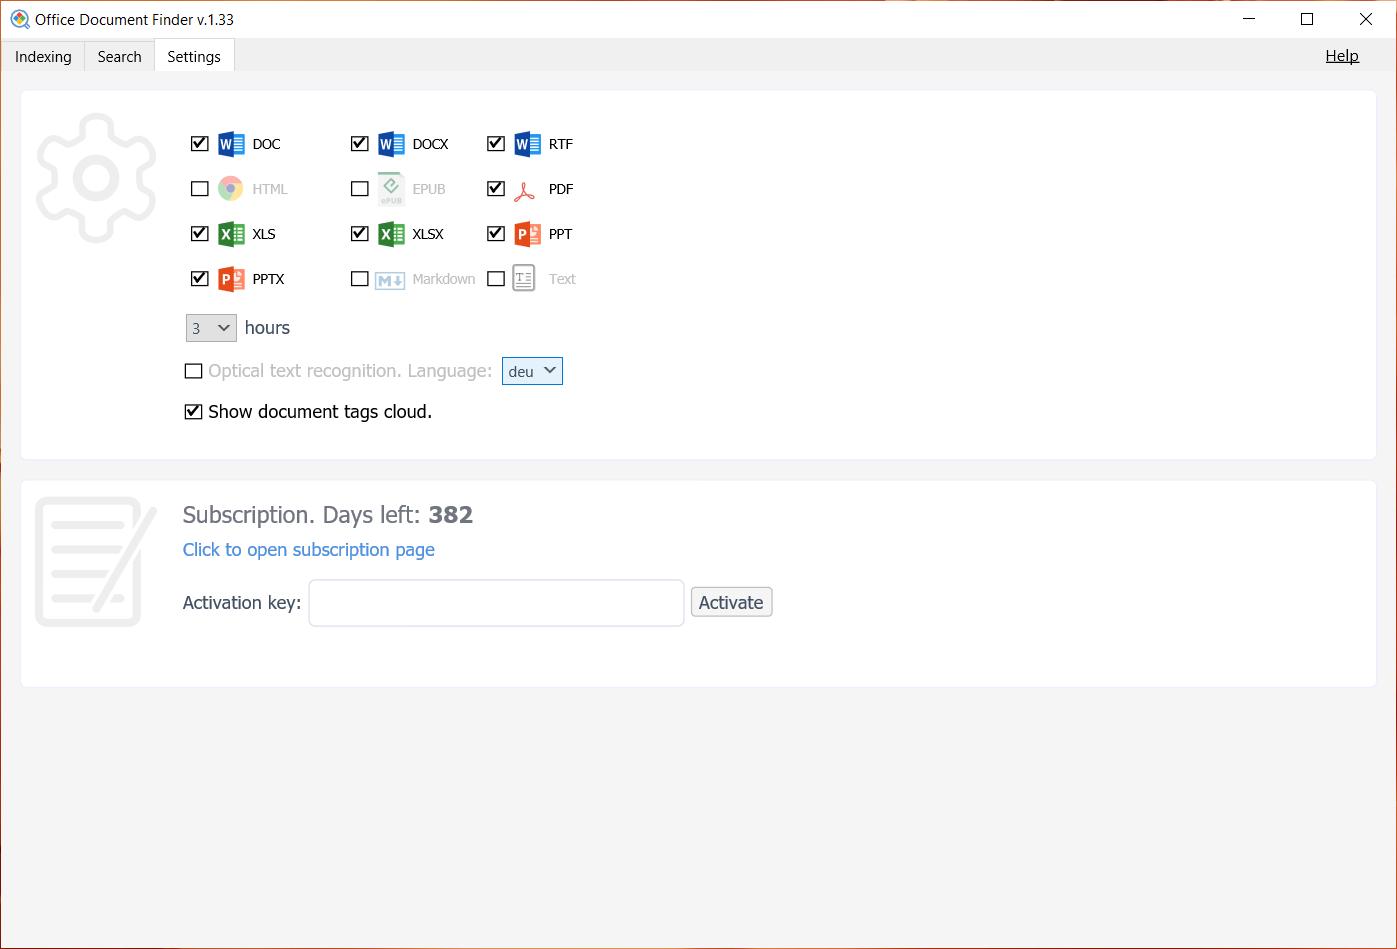 Document Management Software, Office Document Finder Screenshot